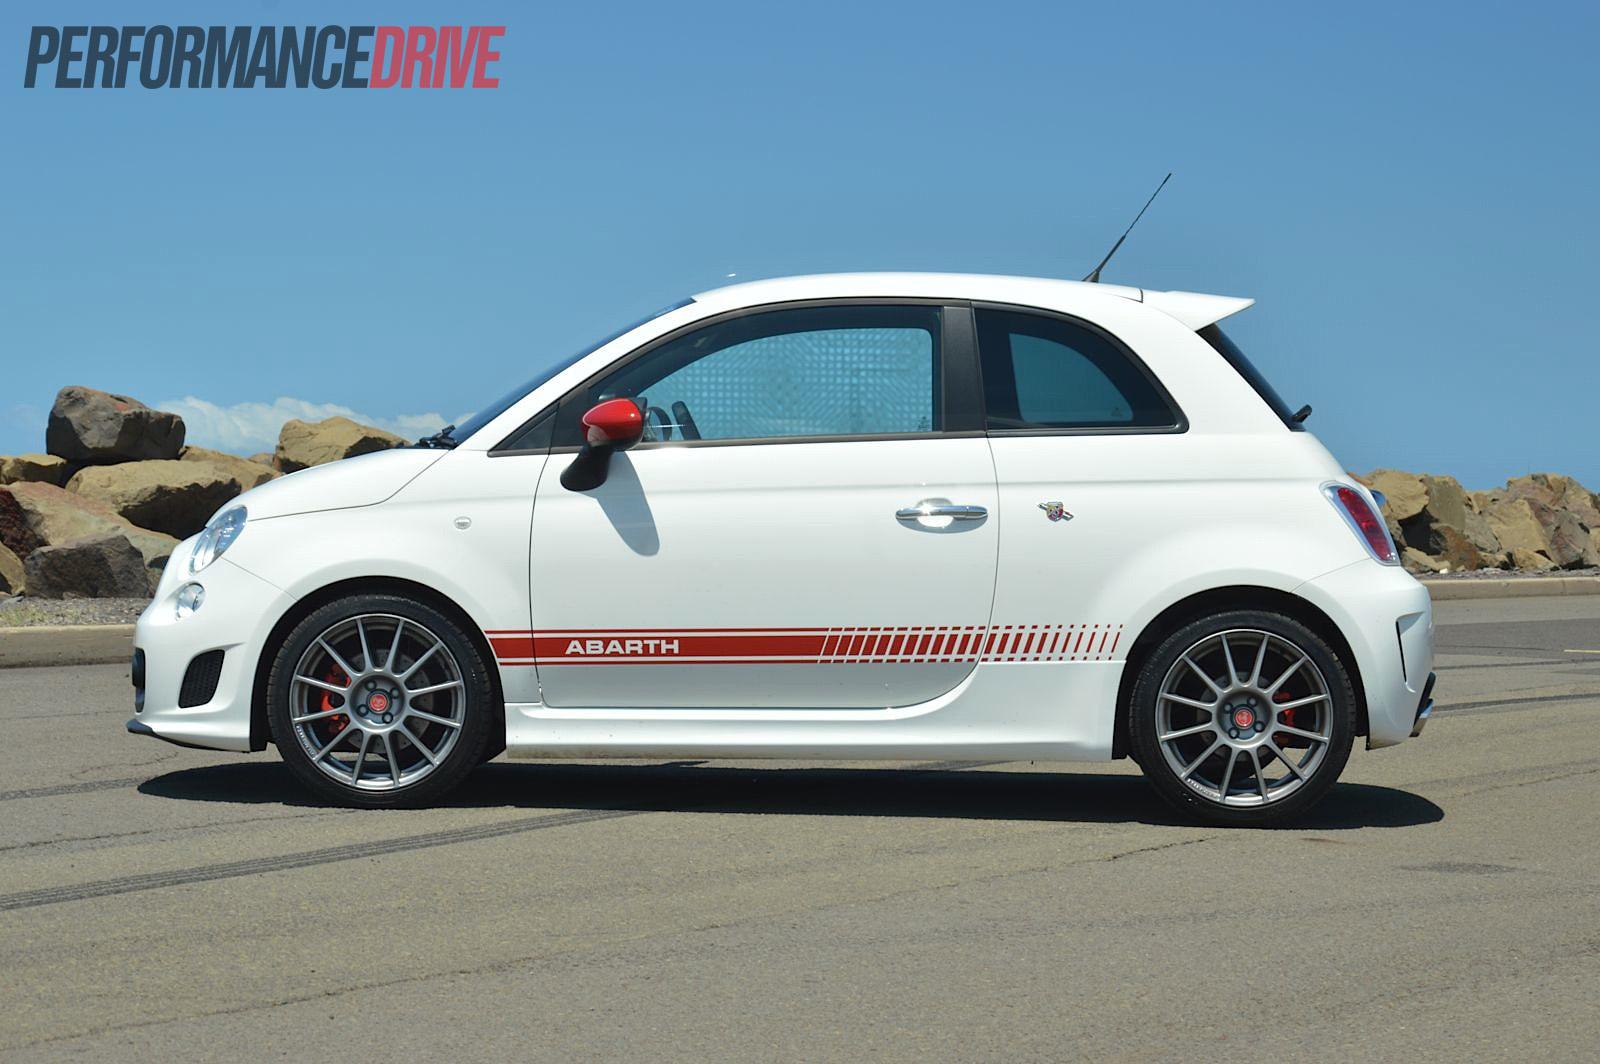 2013 Fiat 500 Abarth Esseesse Review Video Performancedrive